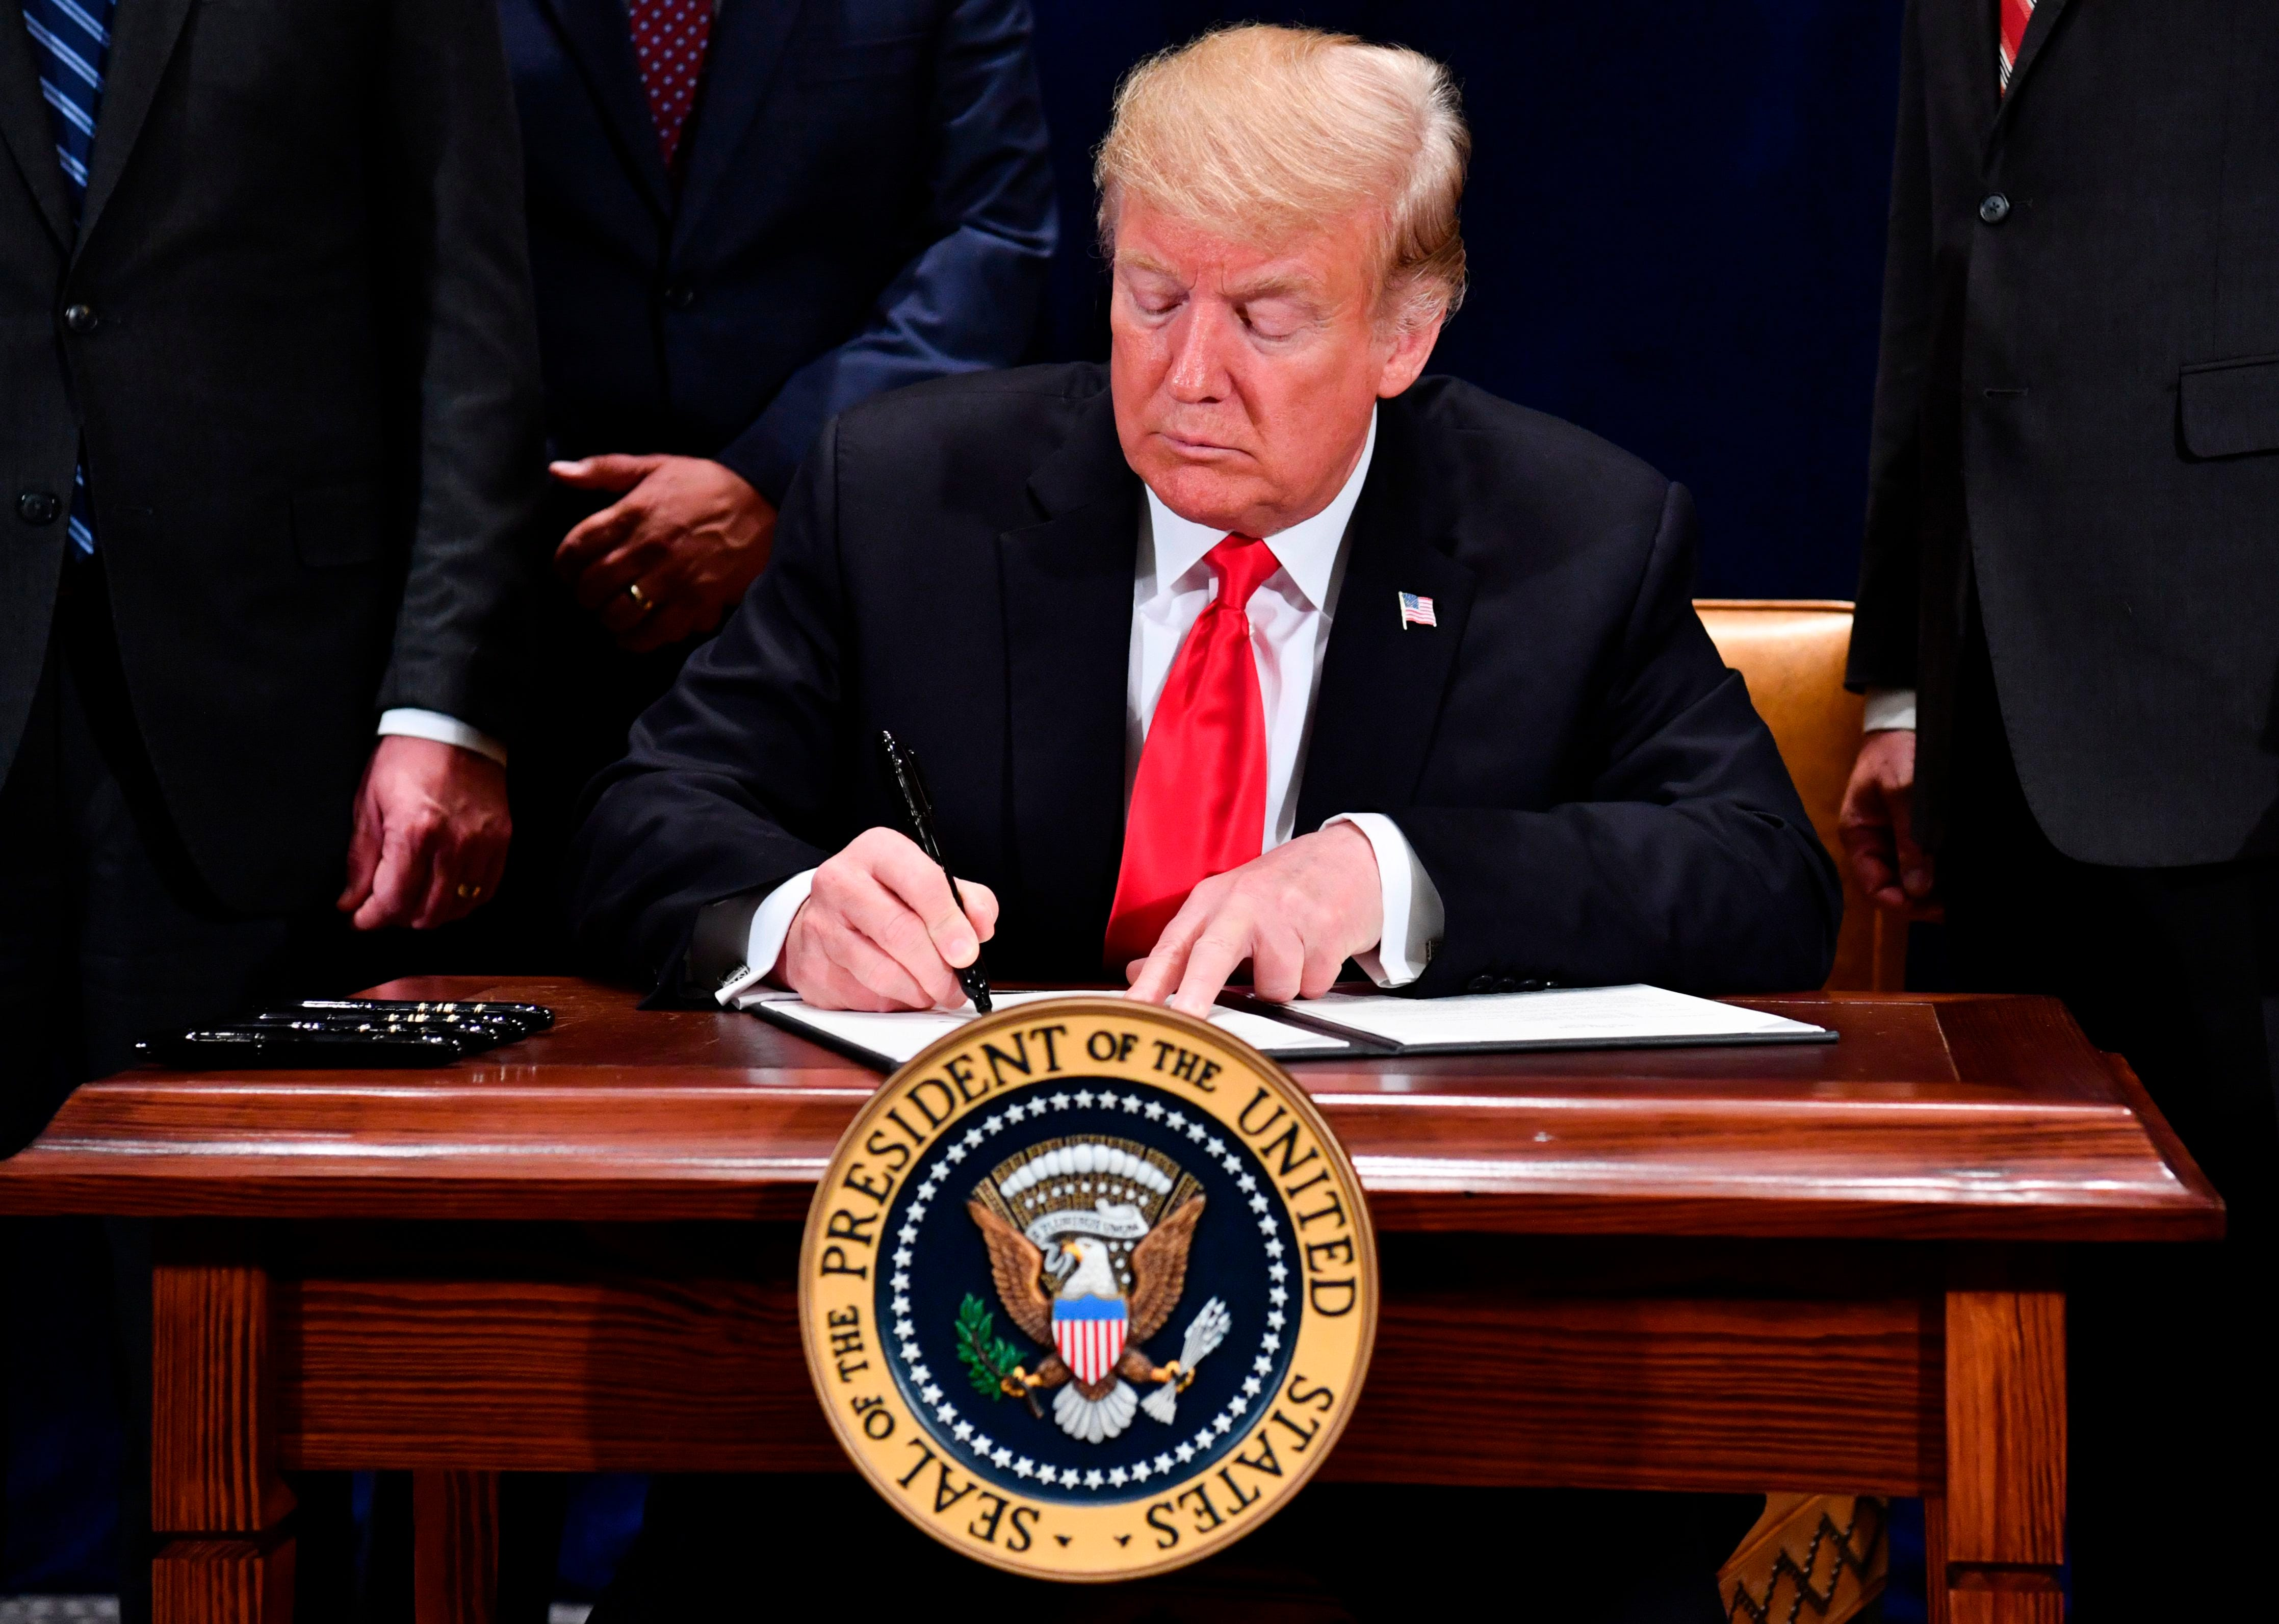 President Trump says he will consider sanctions if Saudis linked to Khashoggi's presumed death